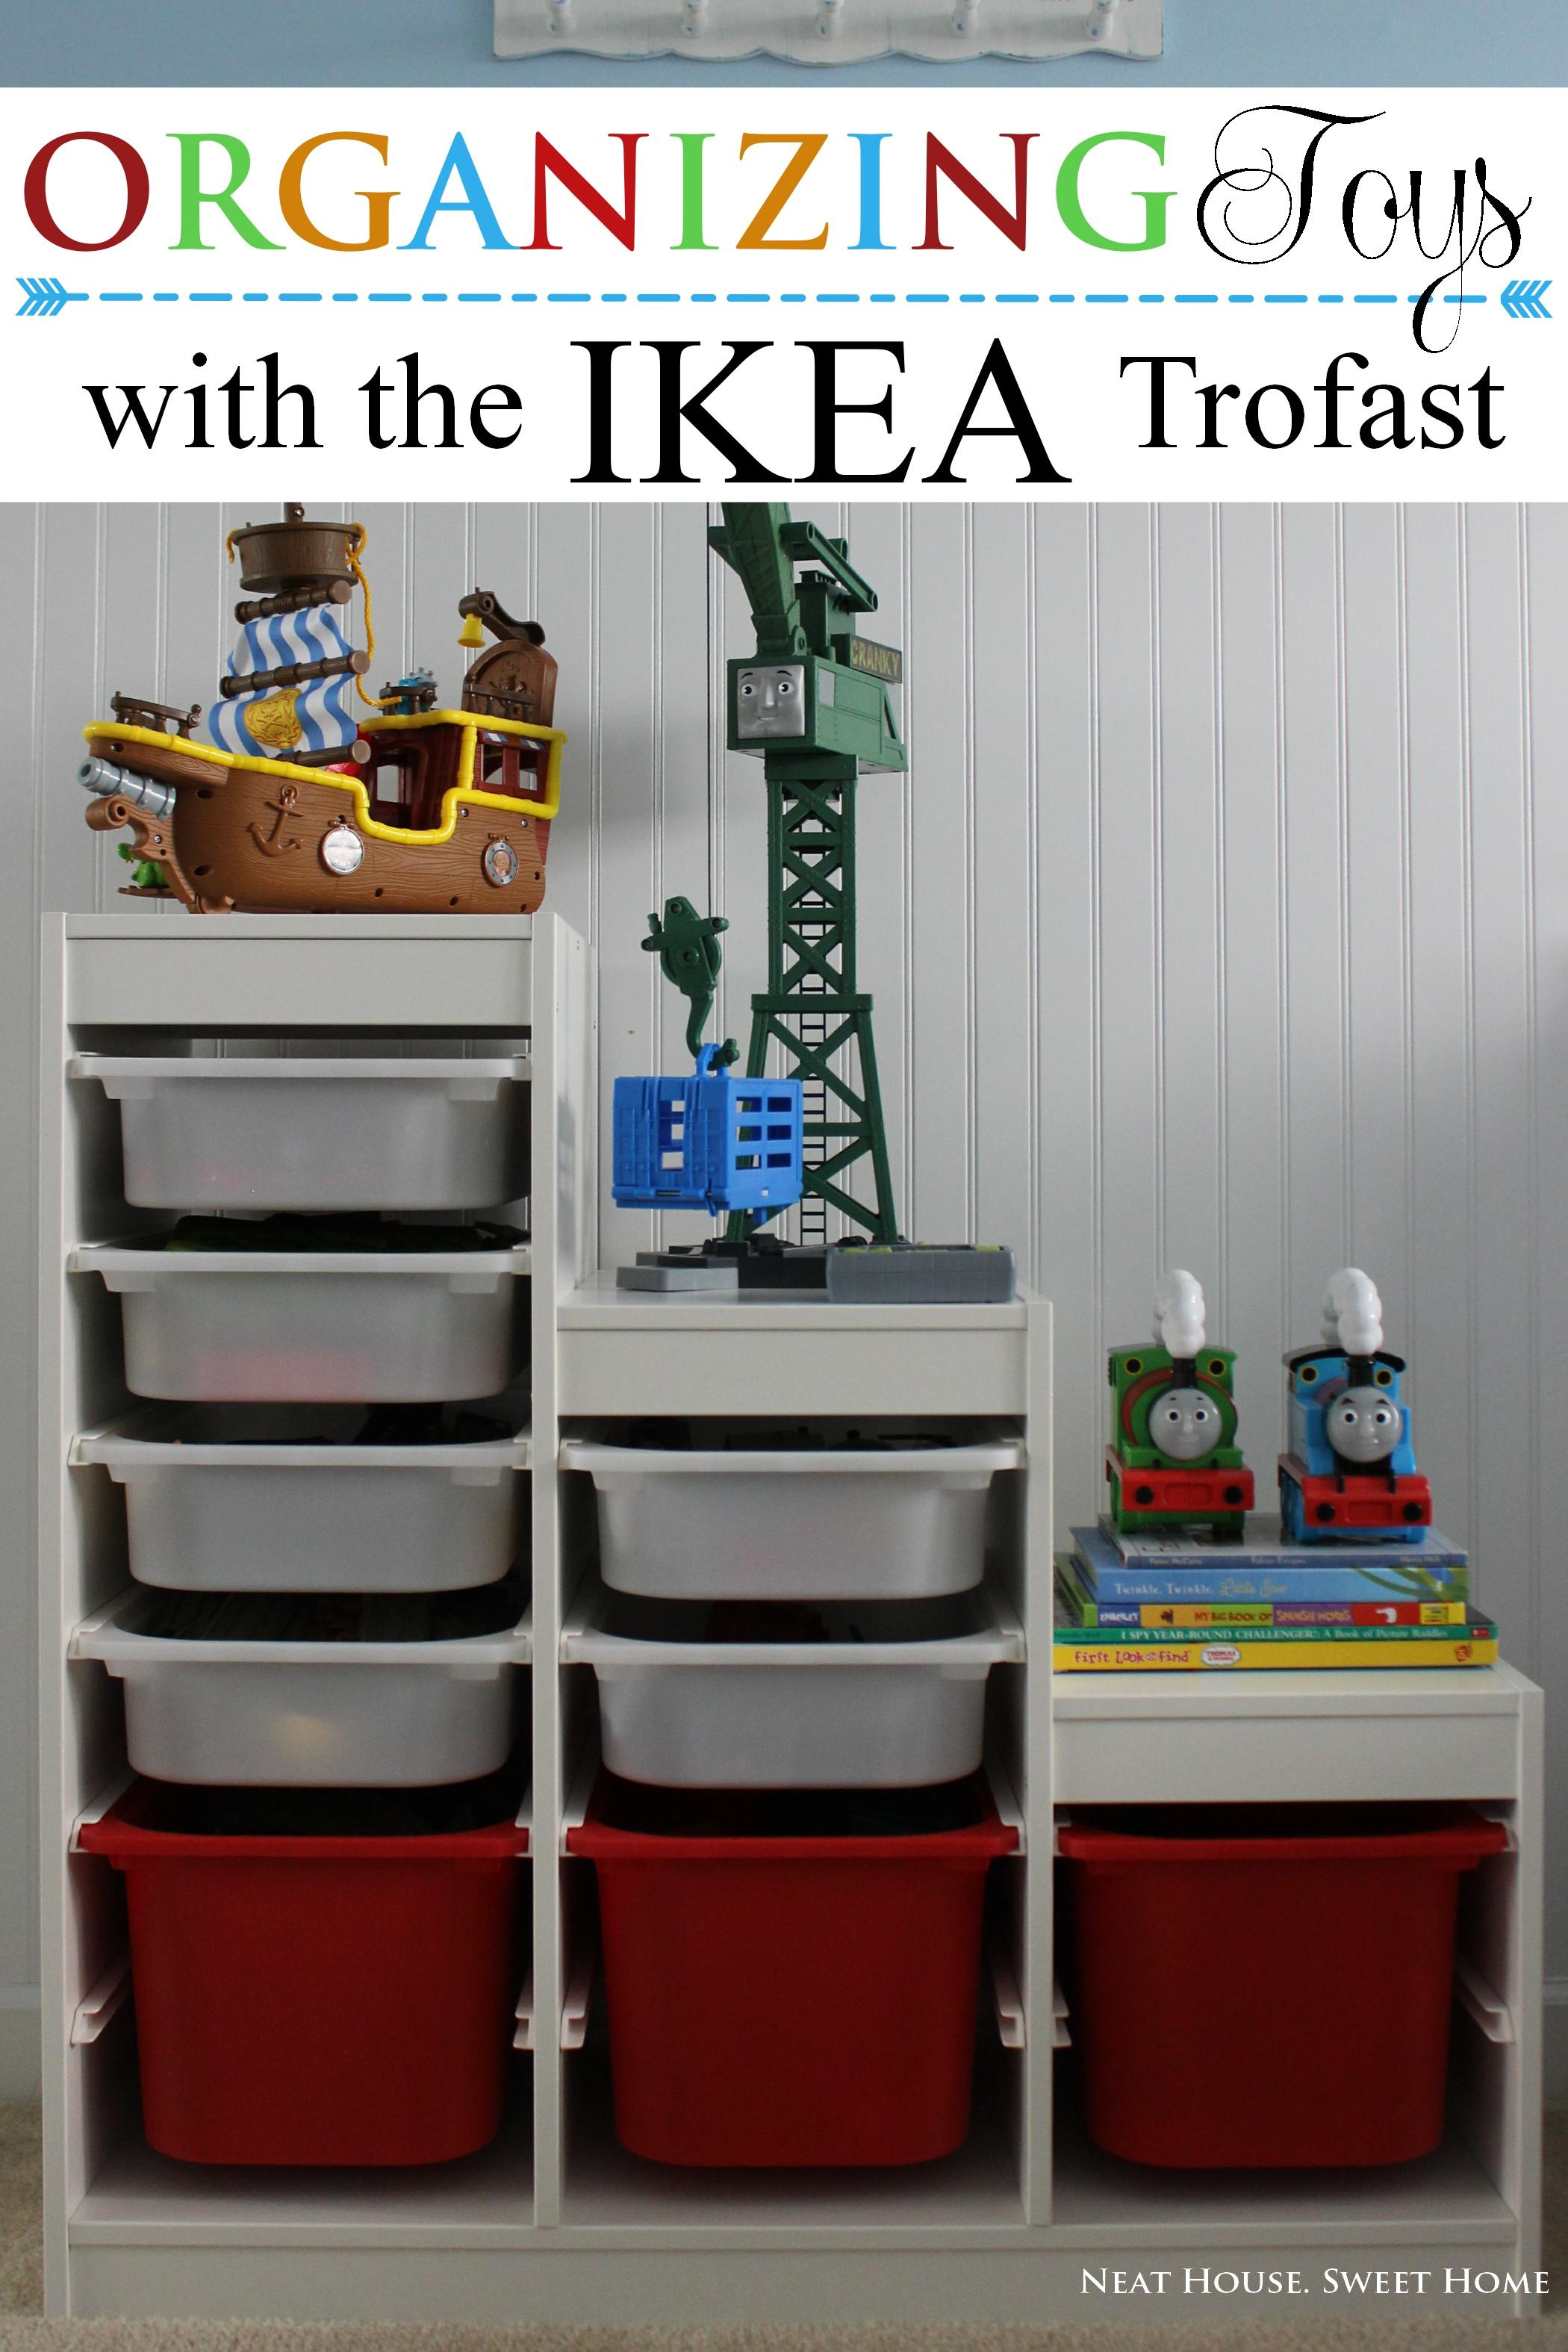 toy with ikea trofast